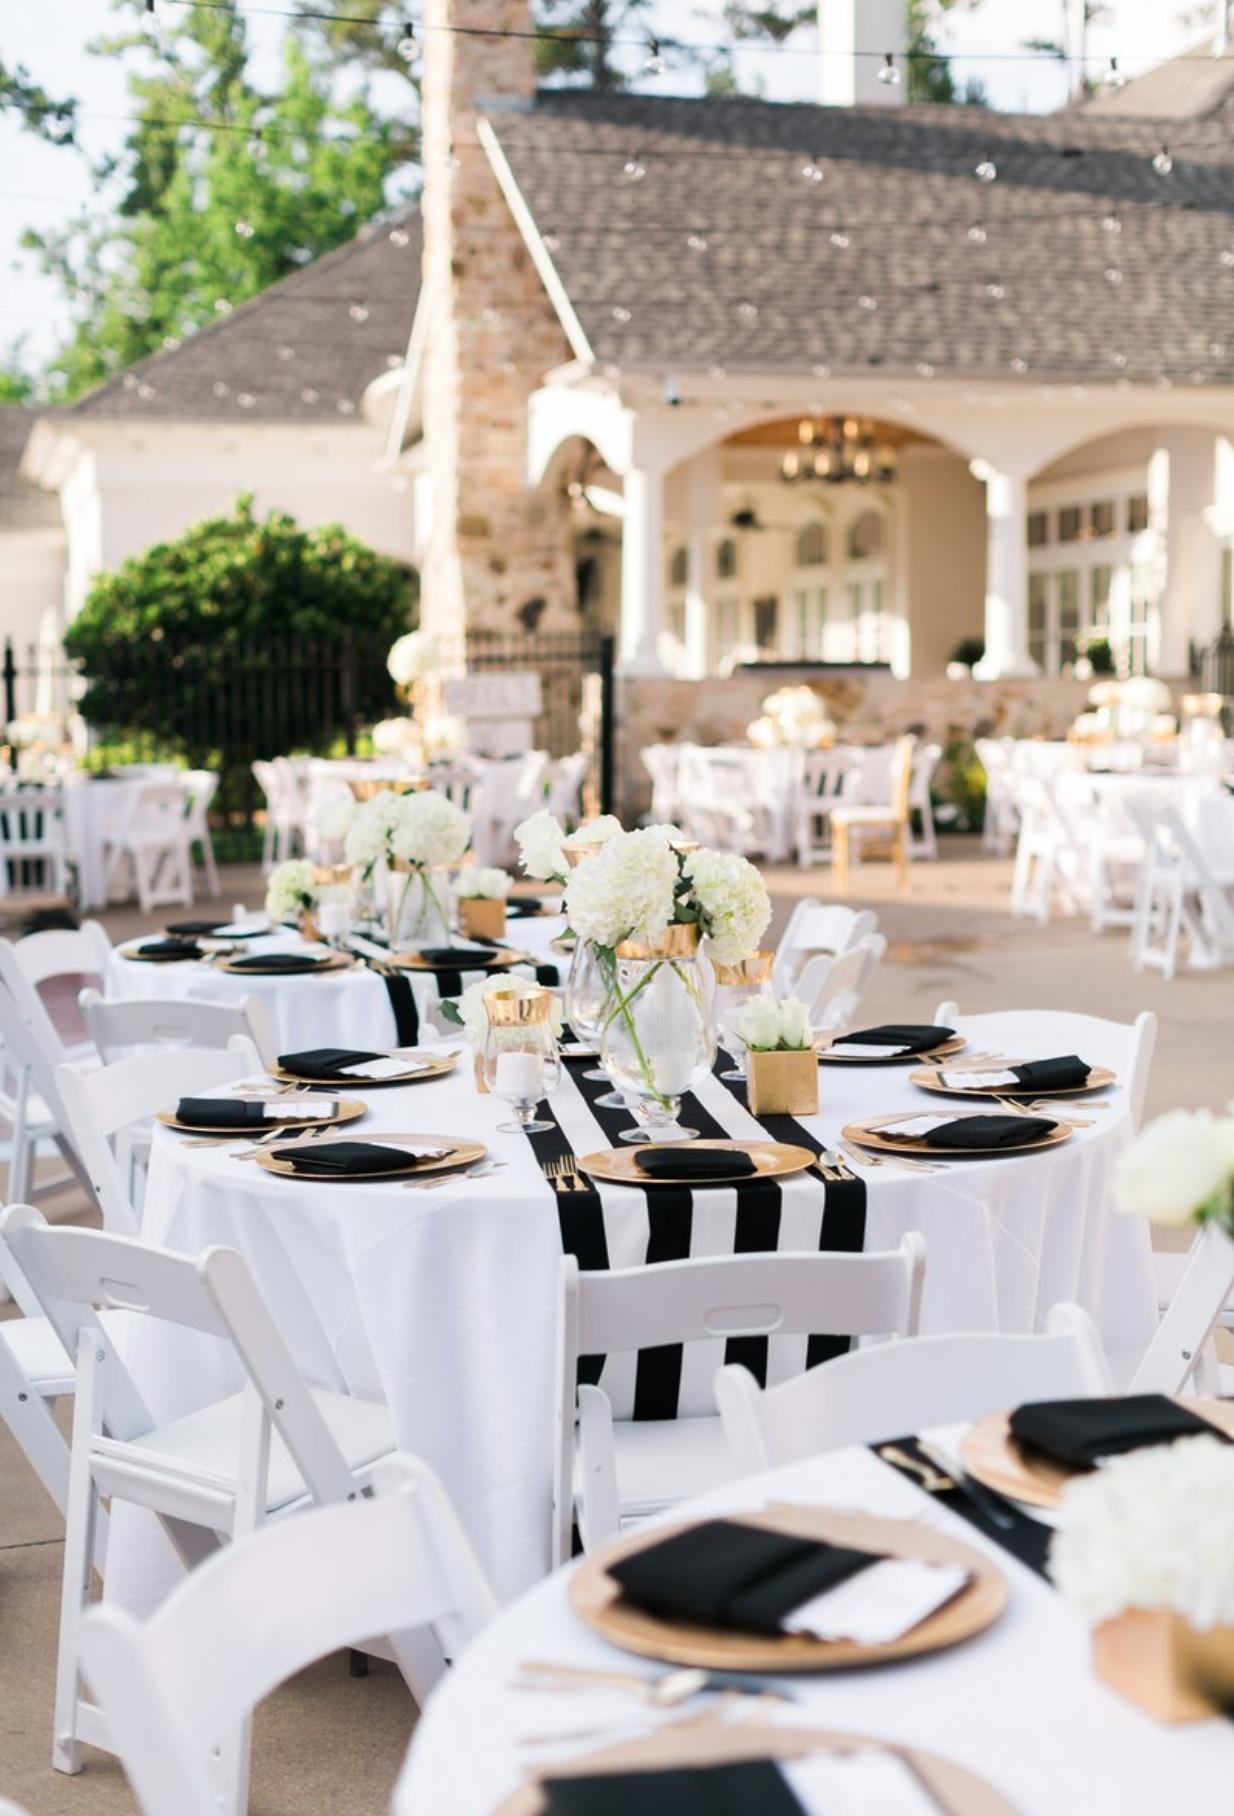 Black and white wedding decor ideas  Black u White u Fresh  Wedding ideas  Pinterest  Wedding Wedding